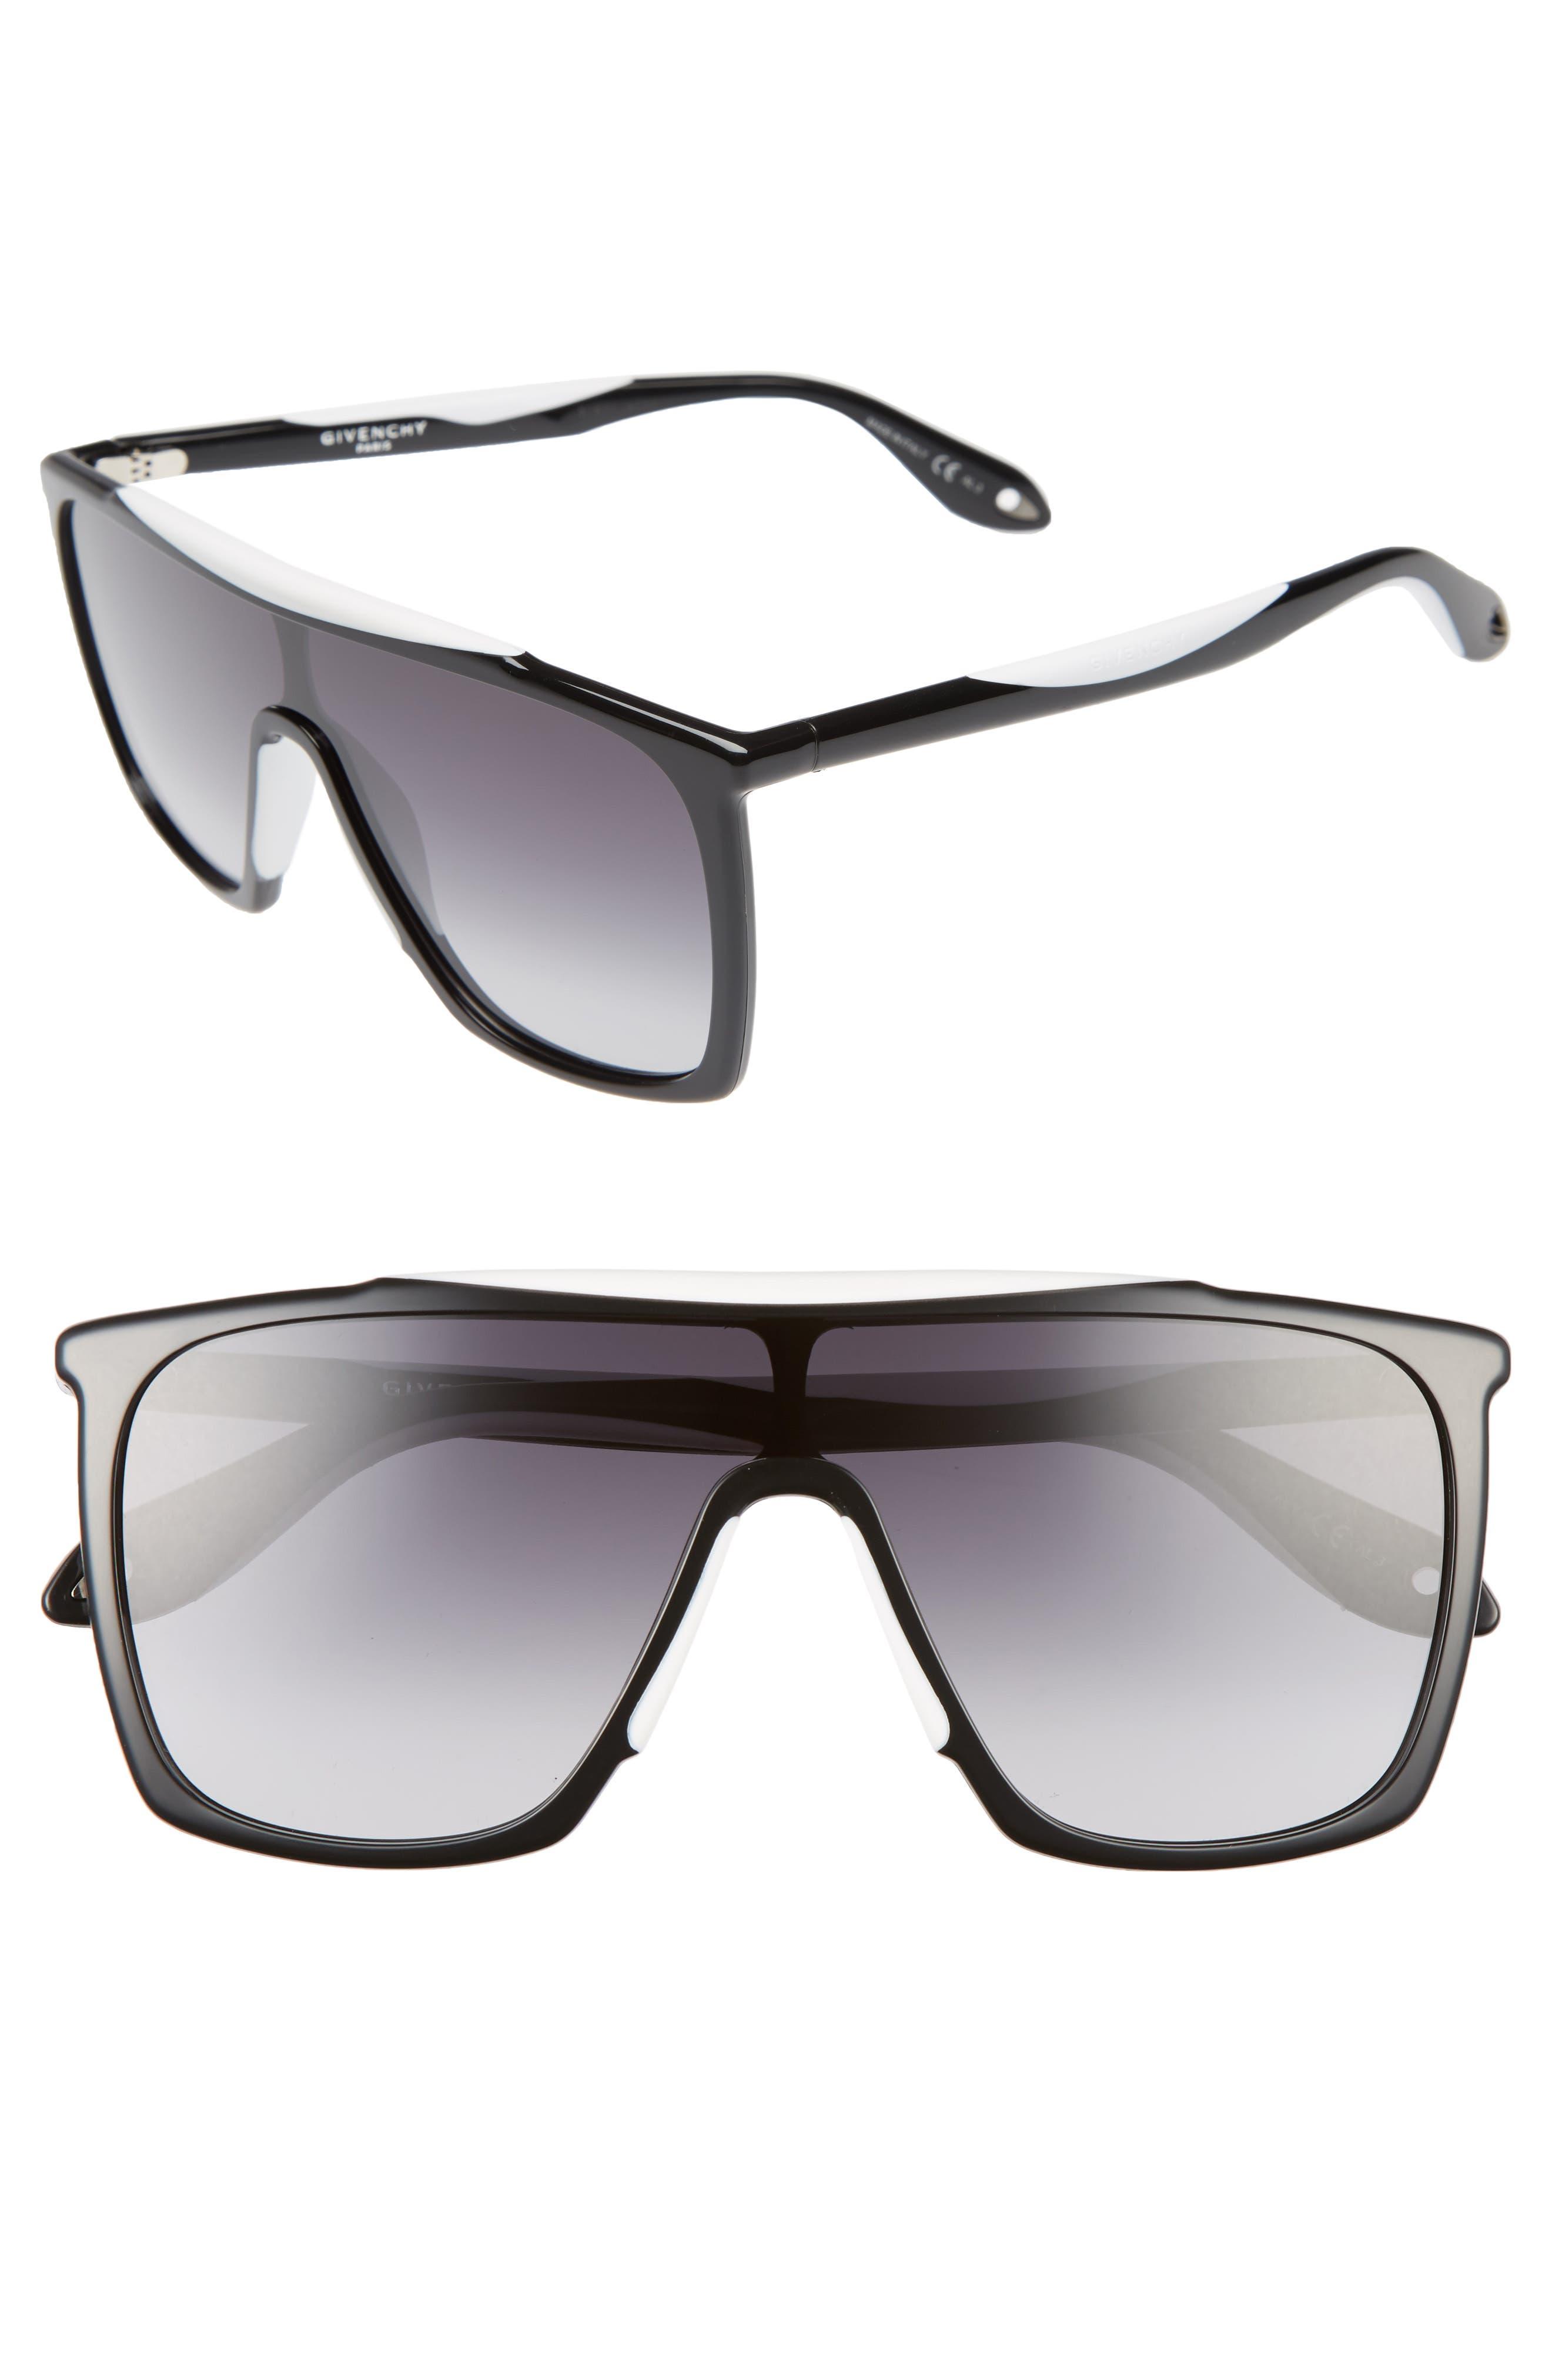 53mm Mask Sunglasses,                             Main thumbnail 1, color,